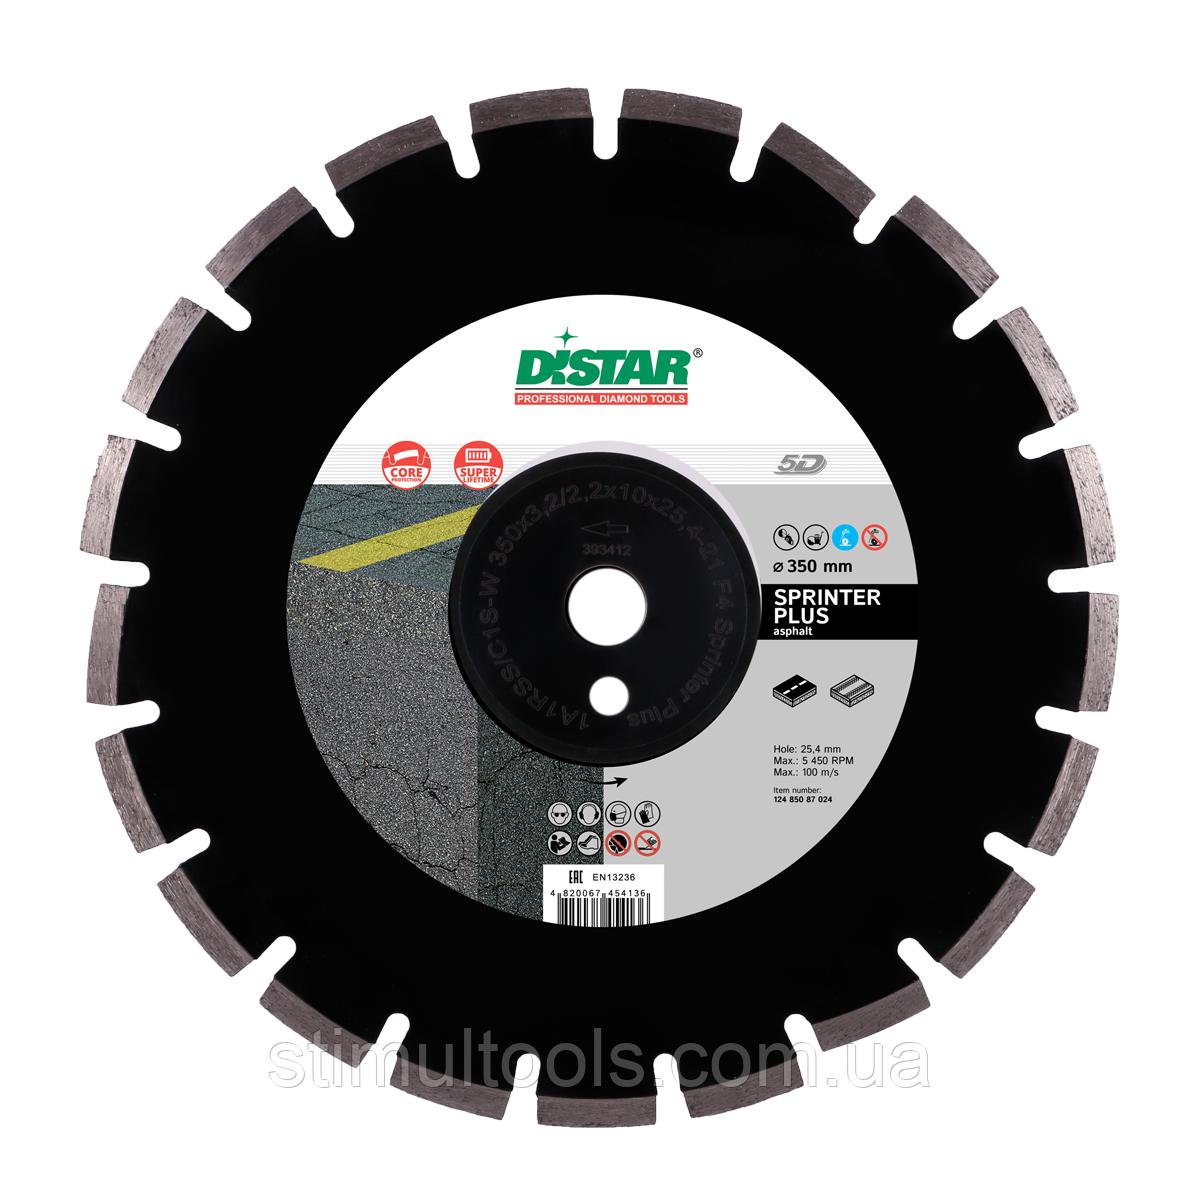 Алмазный диск Distar 1A1RSS/C1S-W 600x4,5/3,5x10x25,4-36 F4 Sprinter Plus